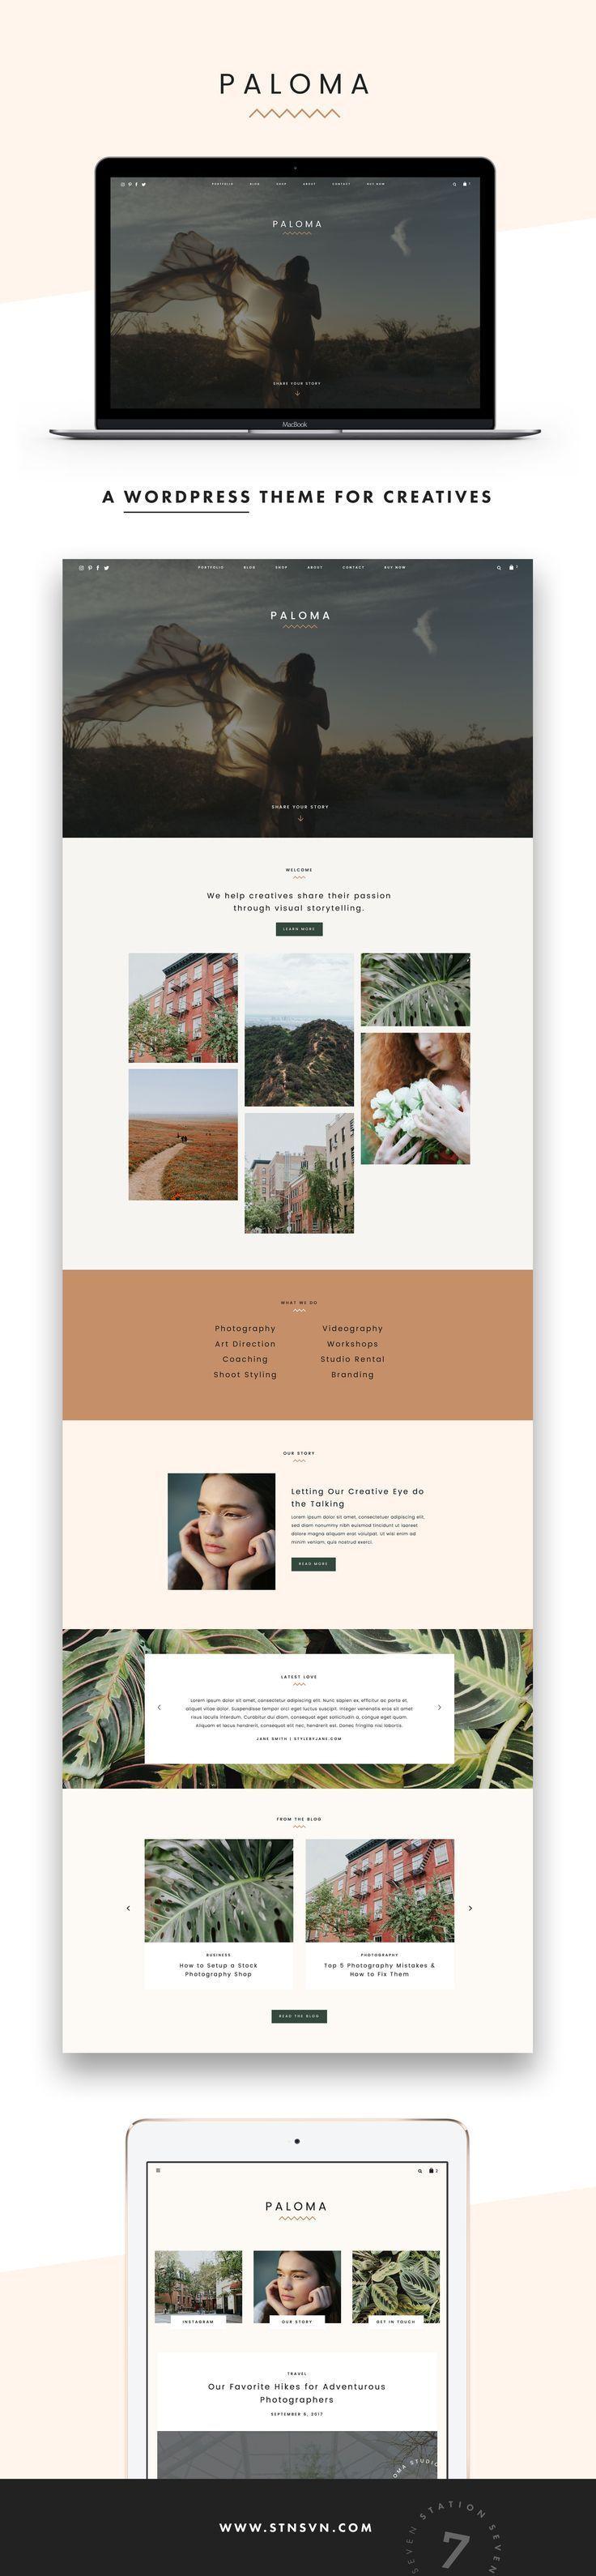 Paloma WordPress Theme — Station Seven Squarespace